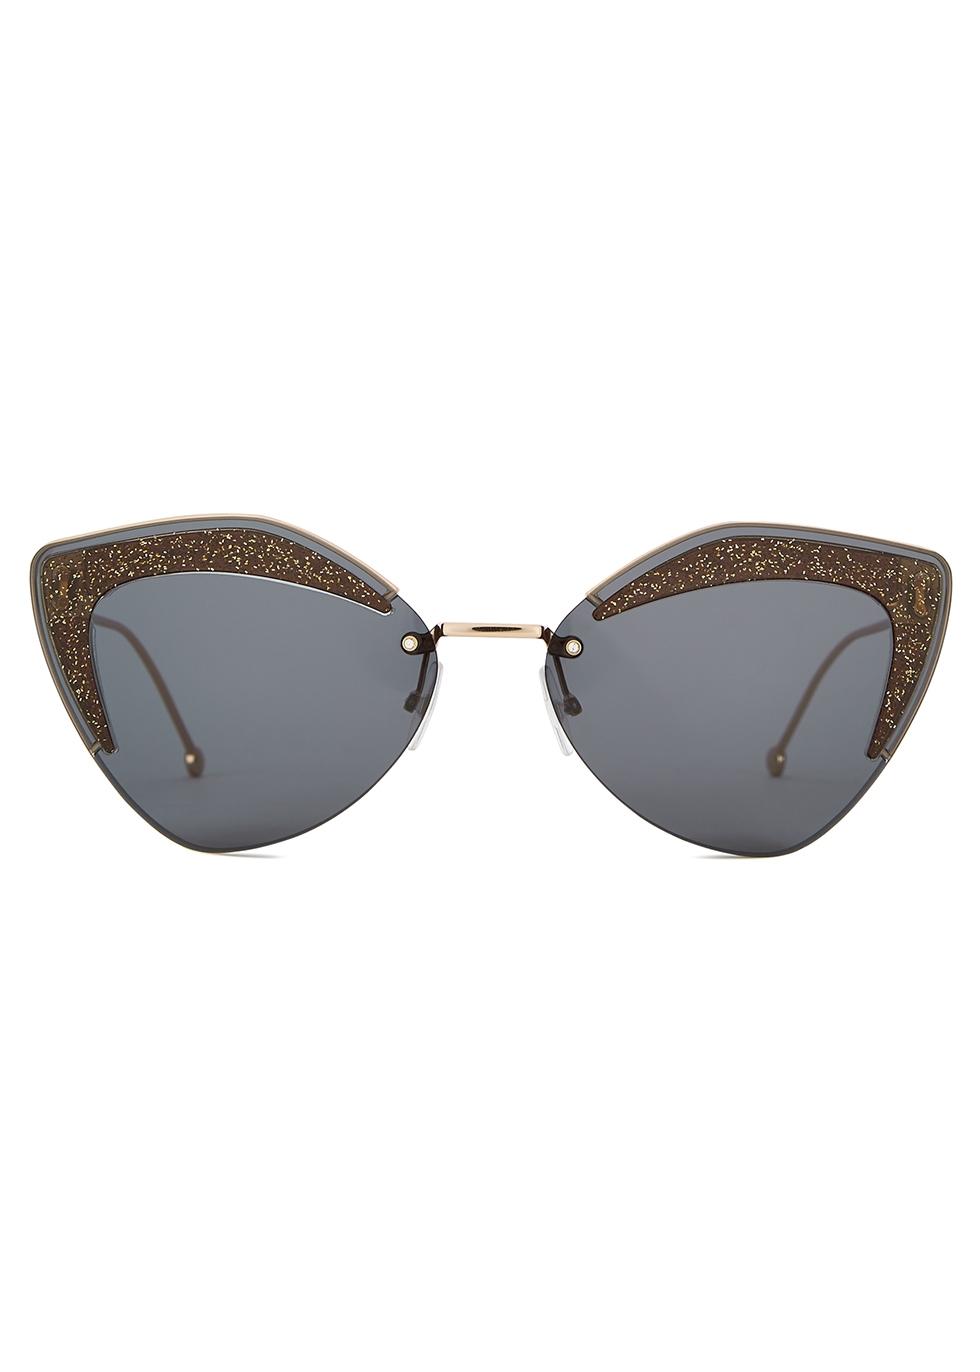 Glittered cat-eye sunglasses - Fendi